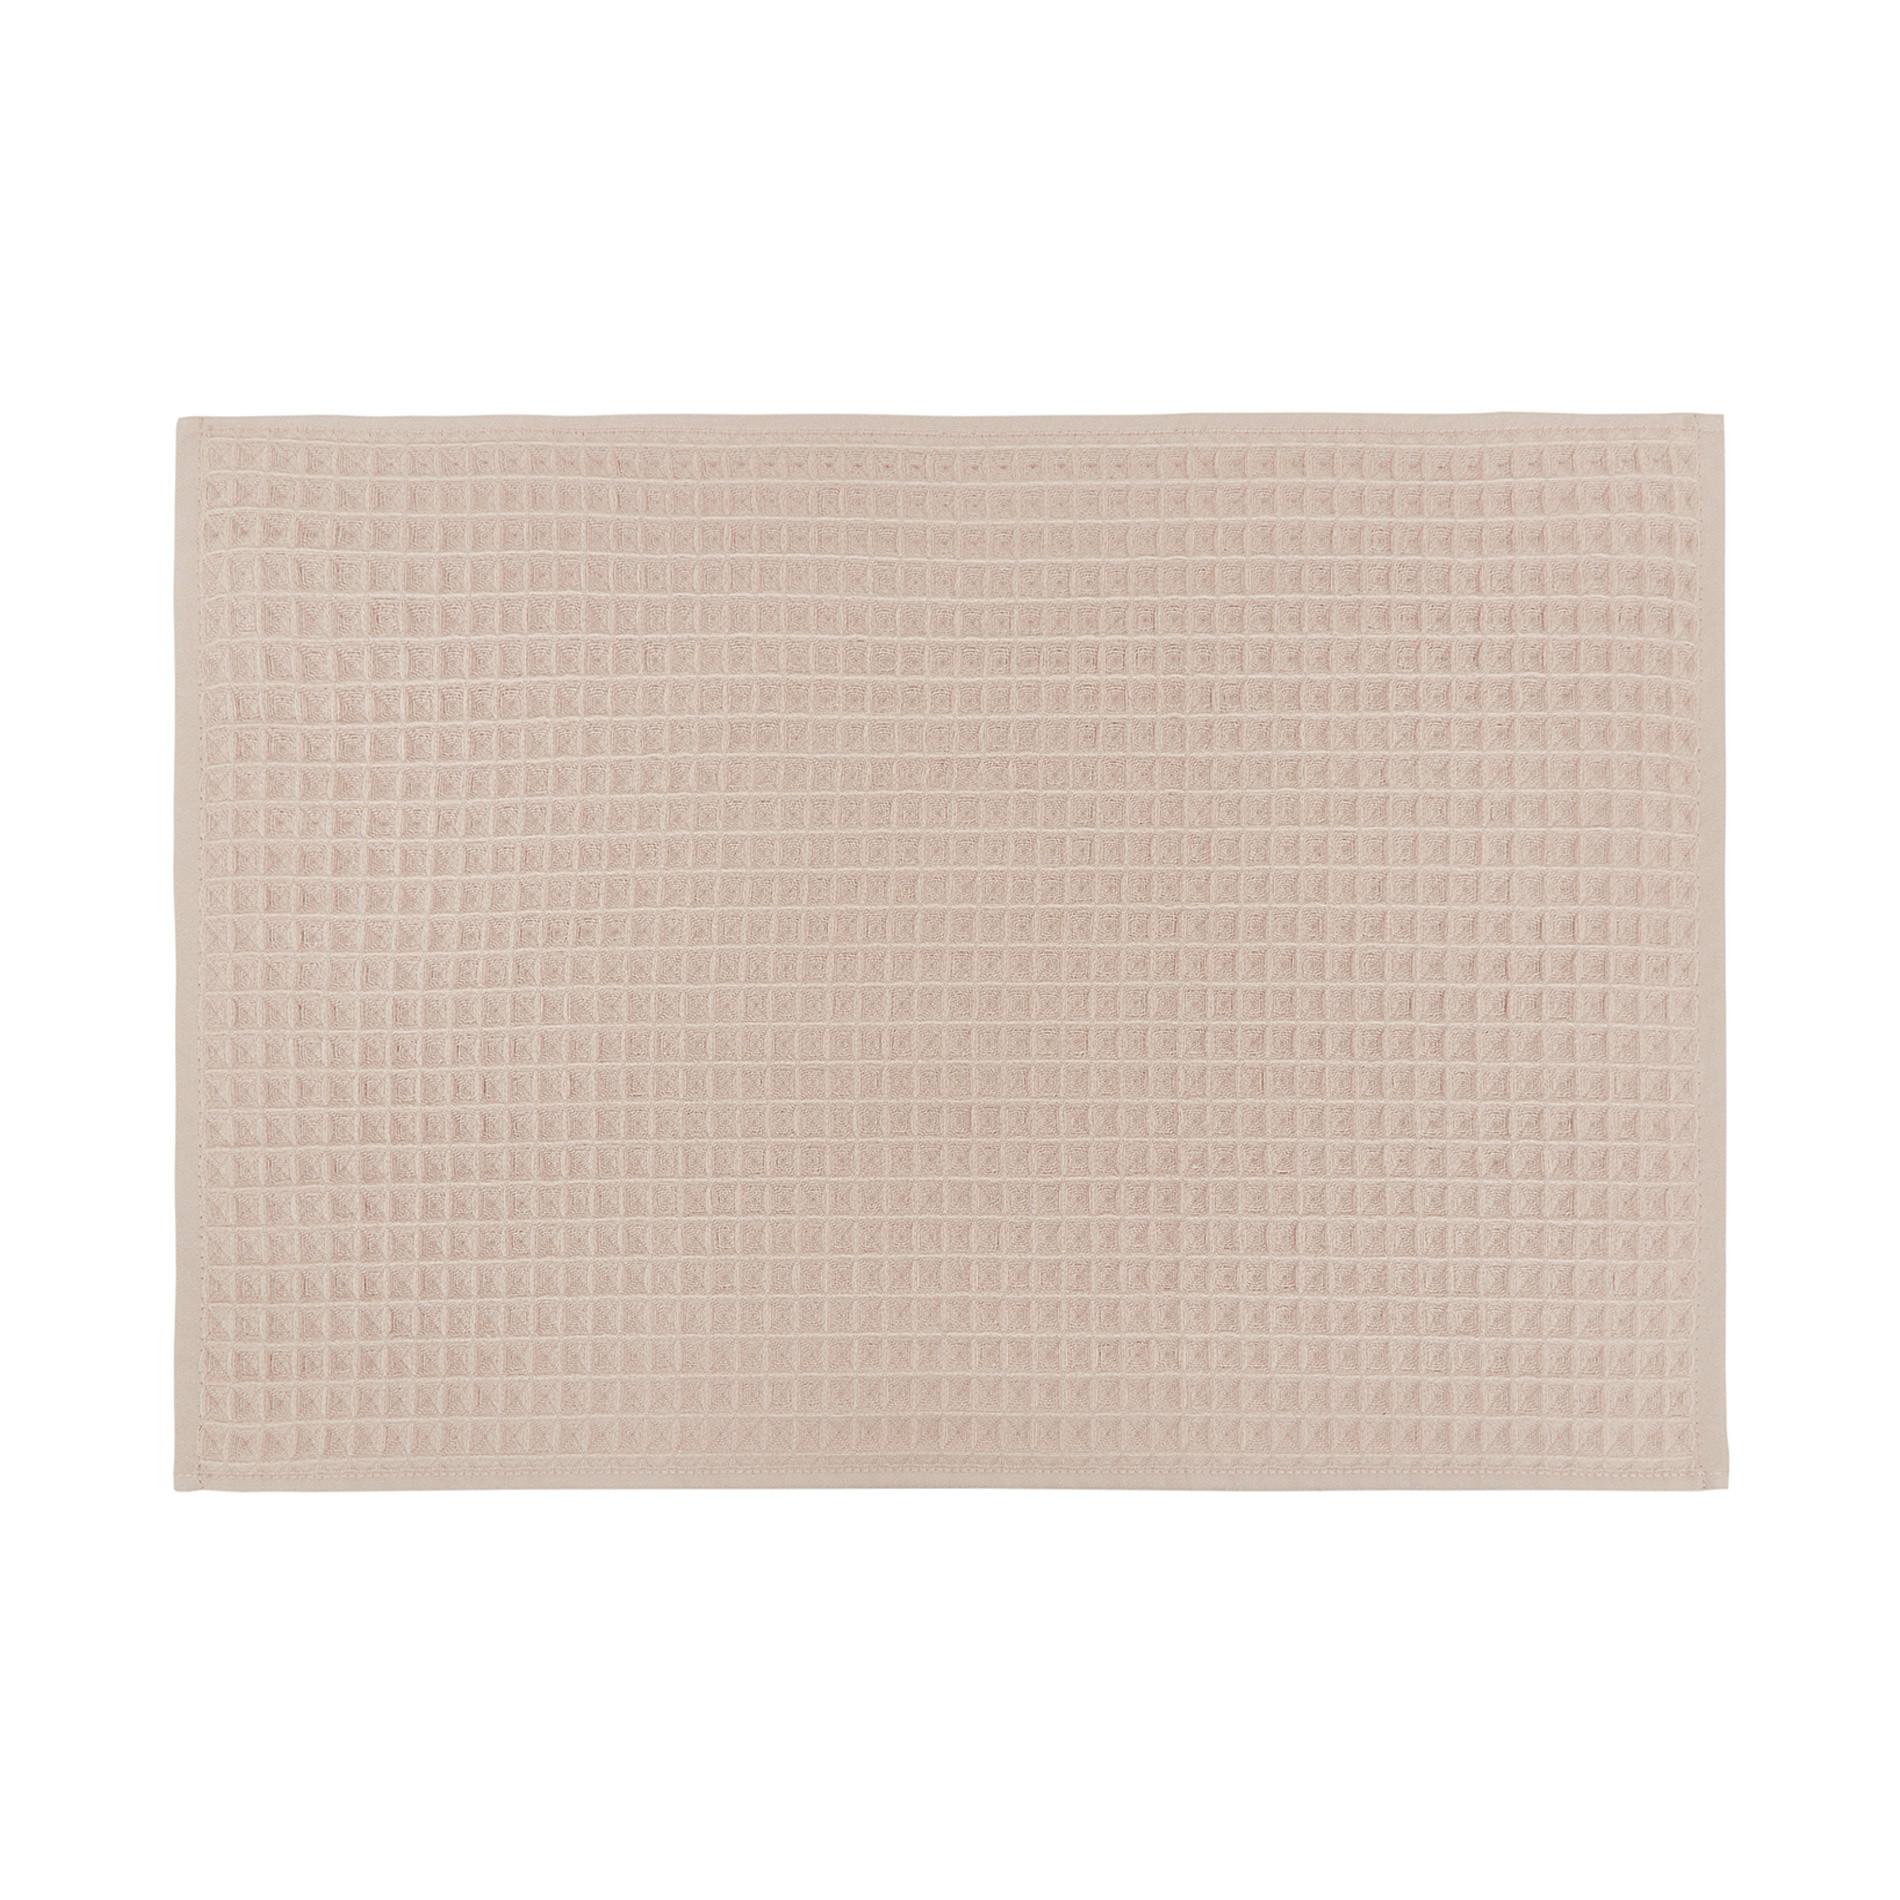 Set asciugamani cotone nido d'ape tinta unita, Beige, large image number 2